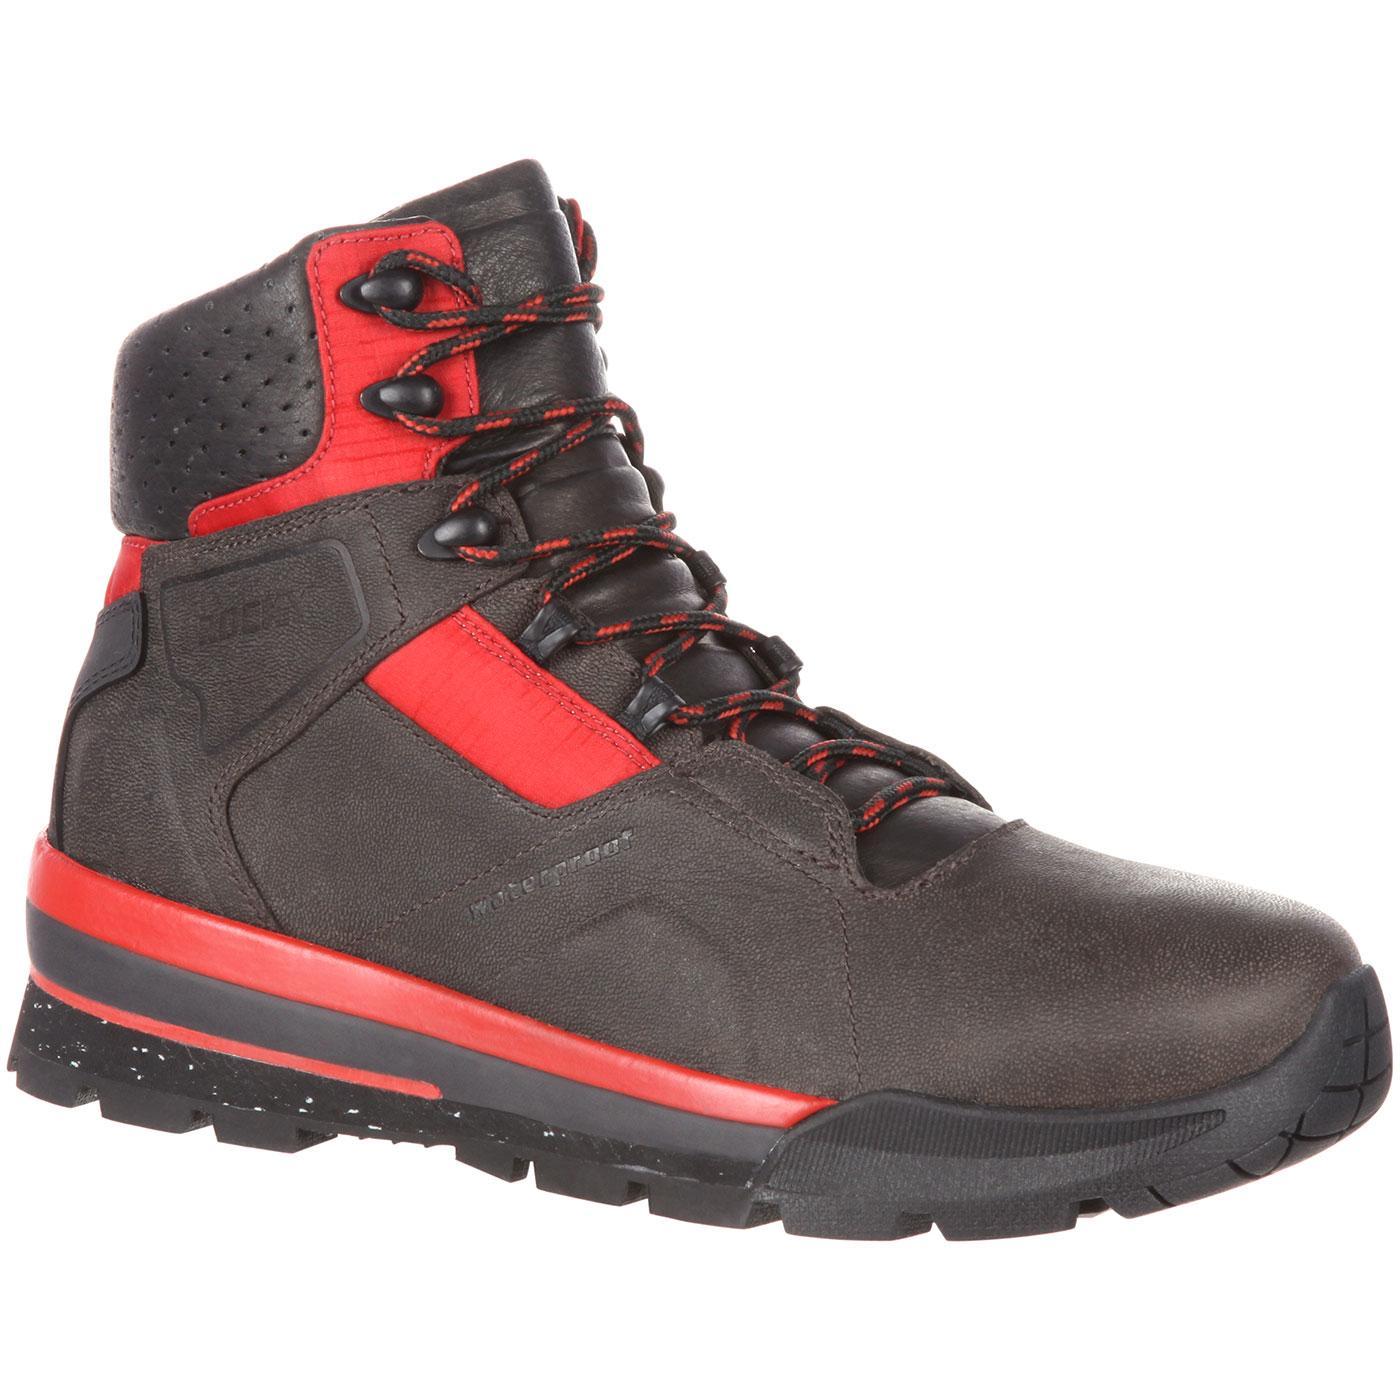 "Men's 6"" S2V Extreme Waterproof Hiker-RKE0036"